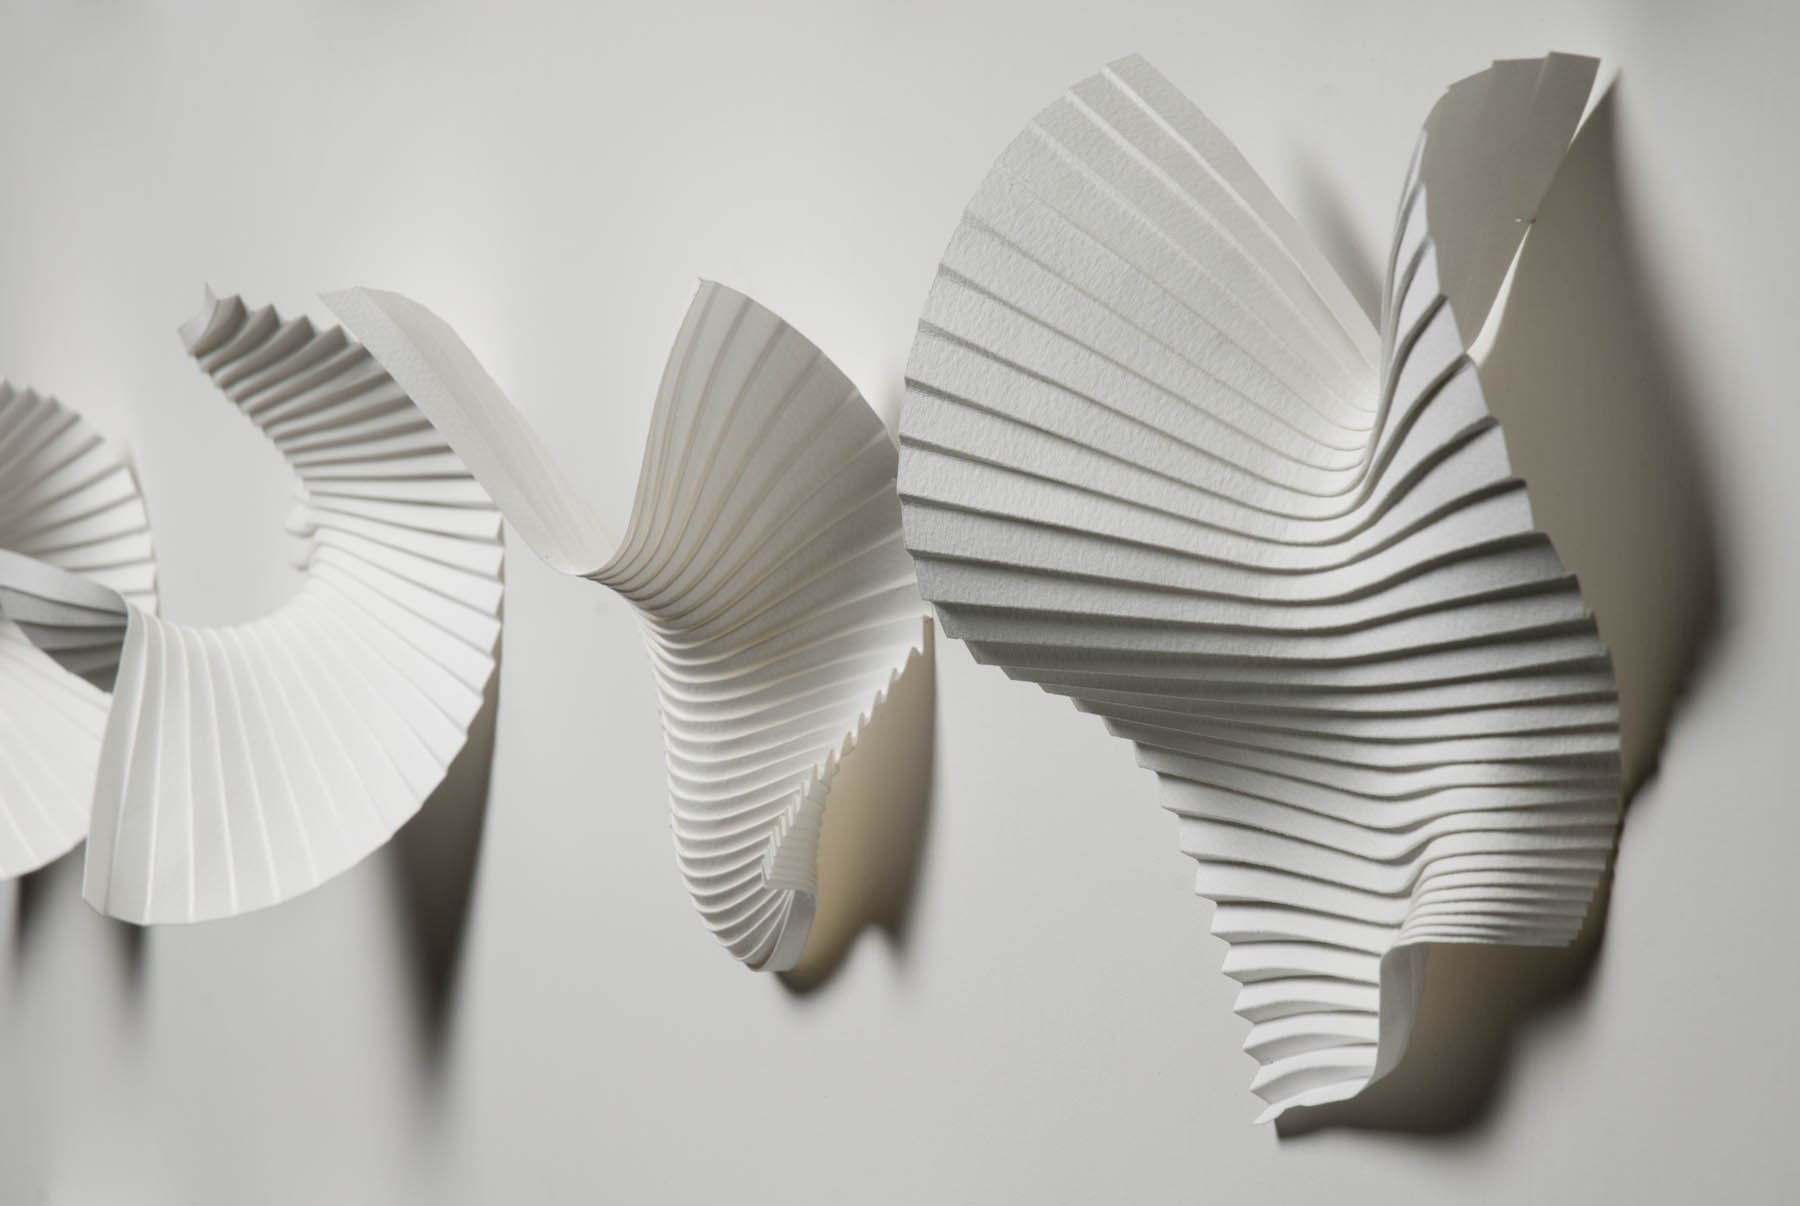 moving paper sculptures